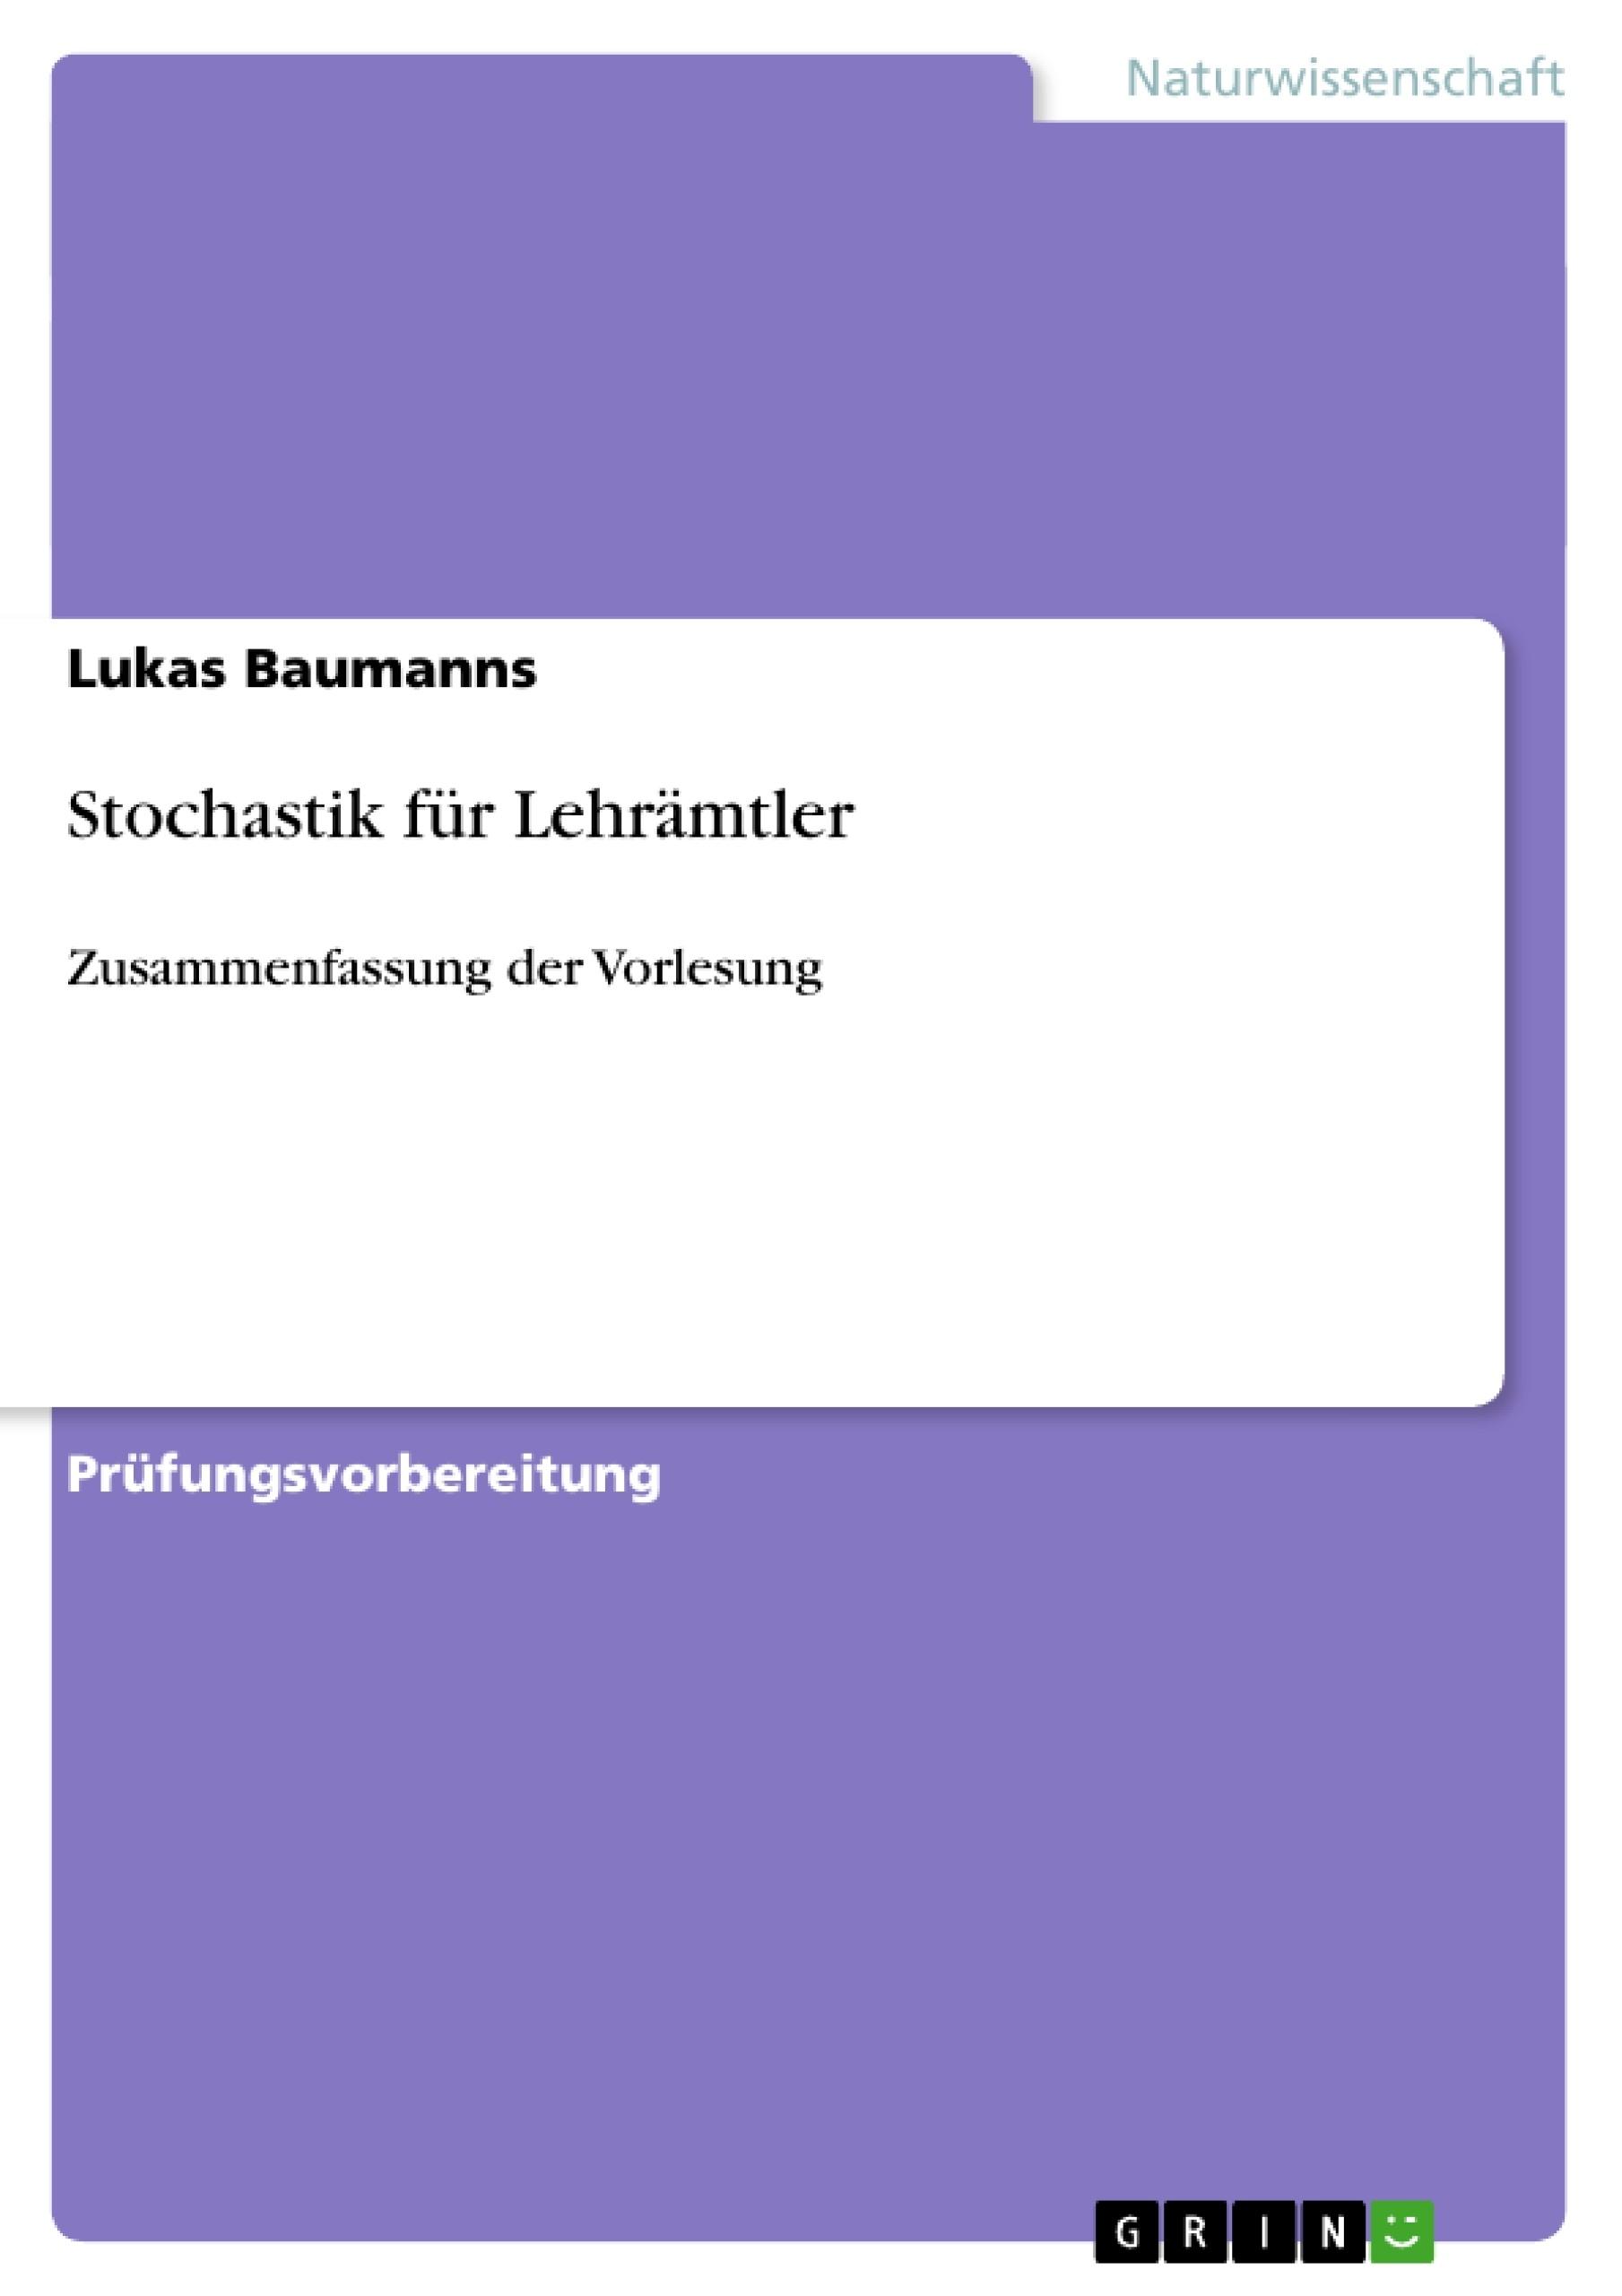 Titel: Stochastik für Lehrämtler